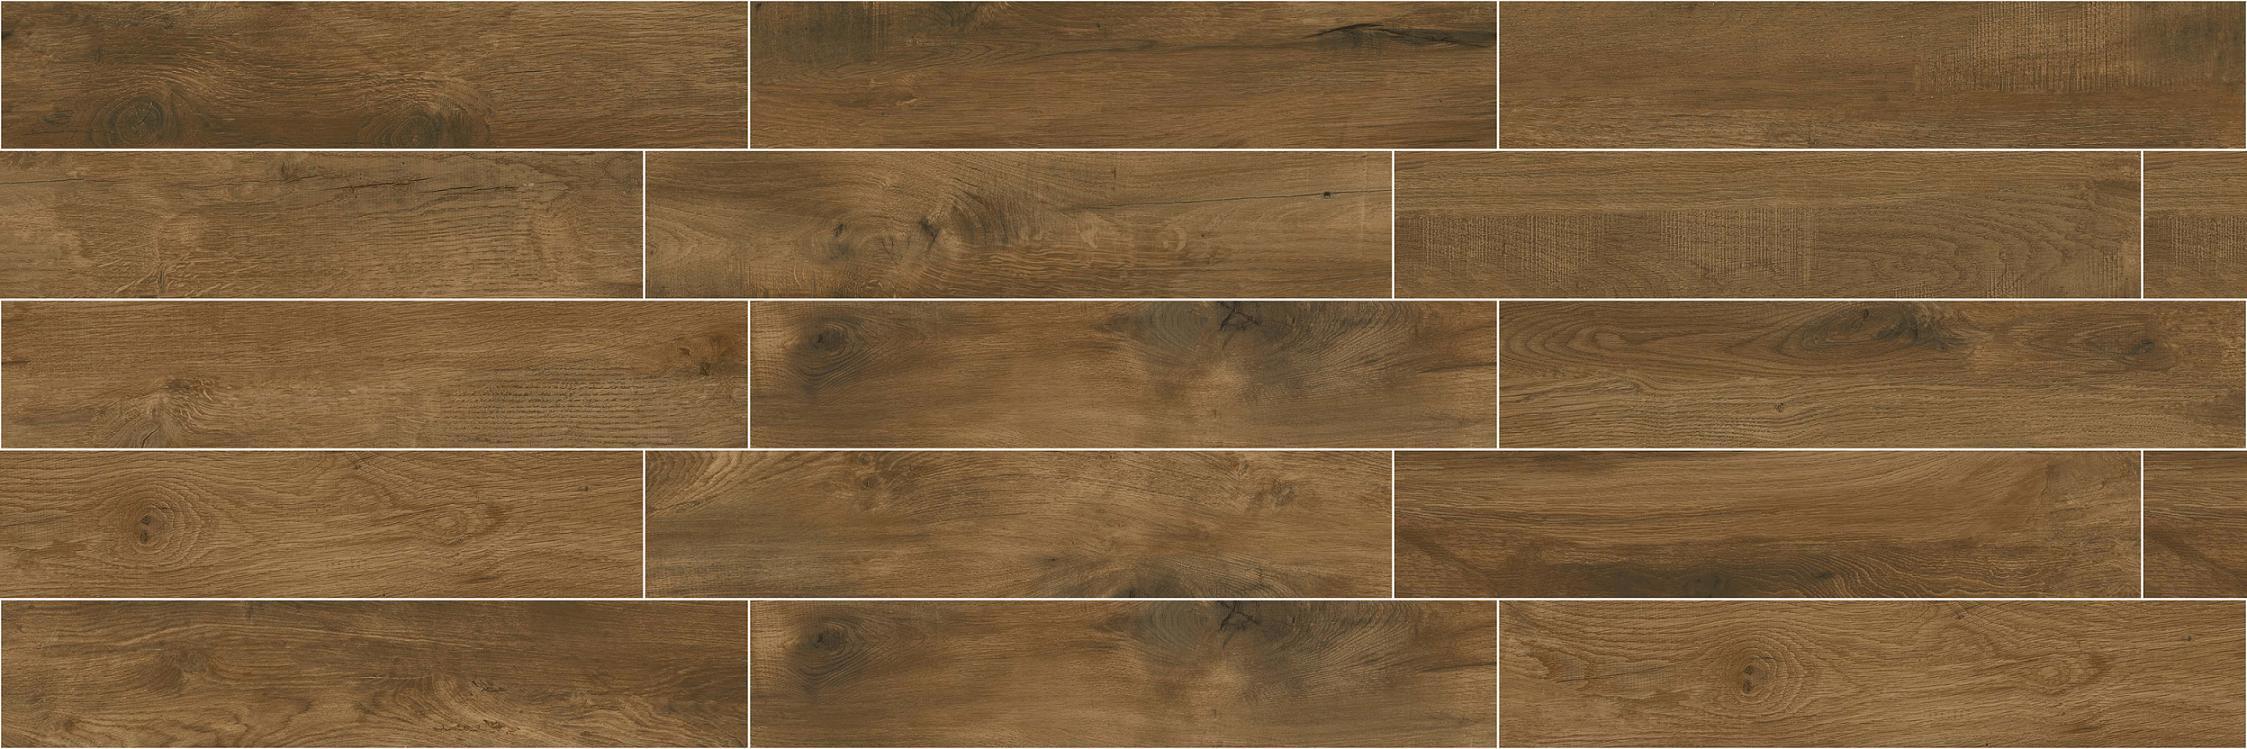 High Quality Building Material Porcelain Wood Tile Floor Tile Lnc209008 Brown